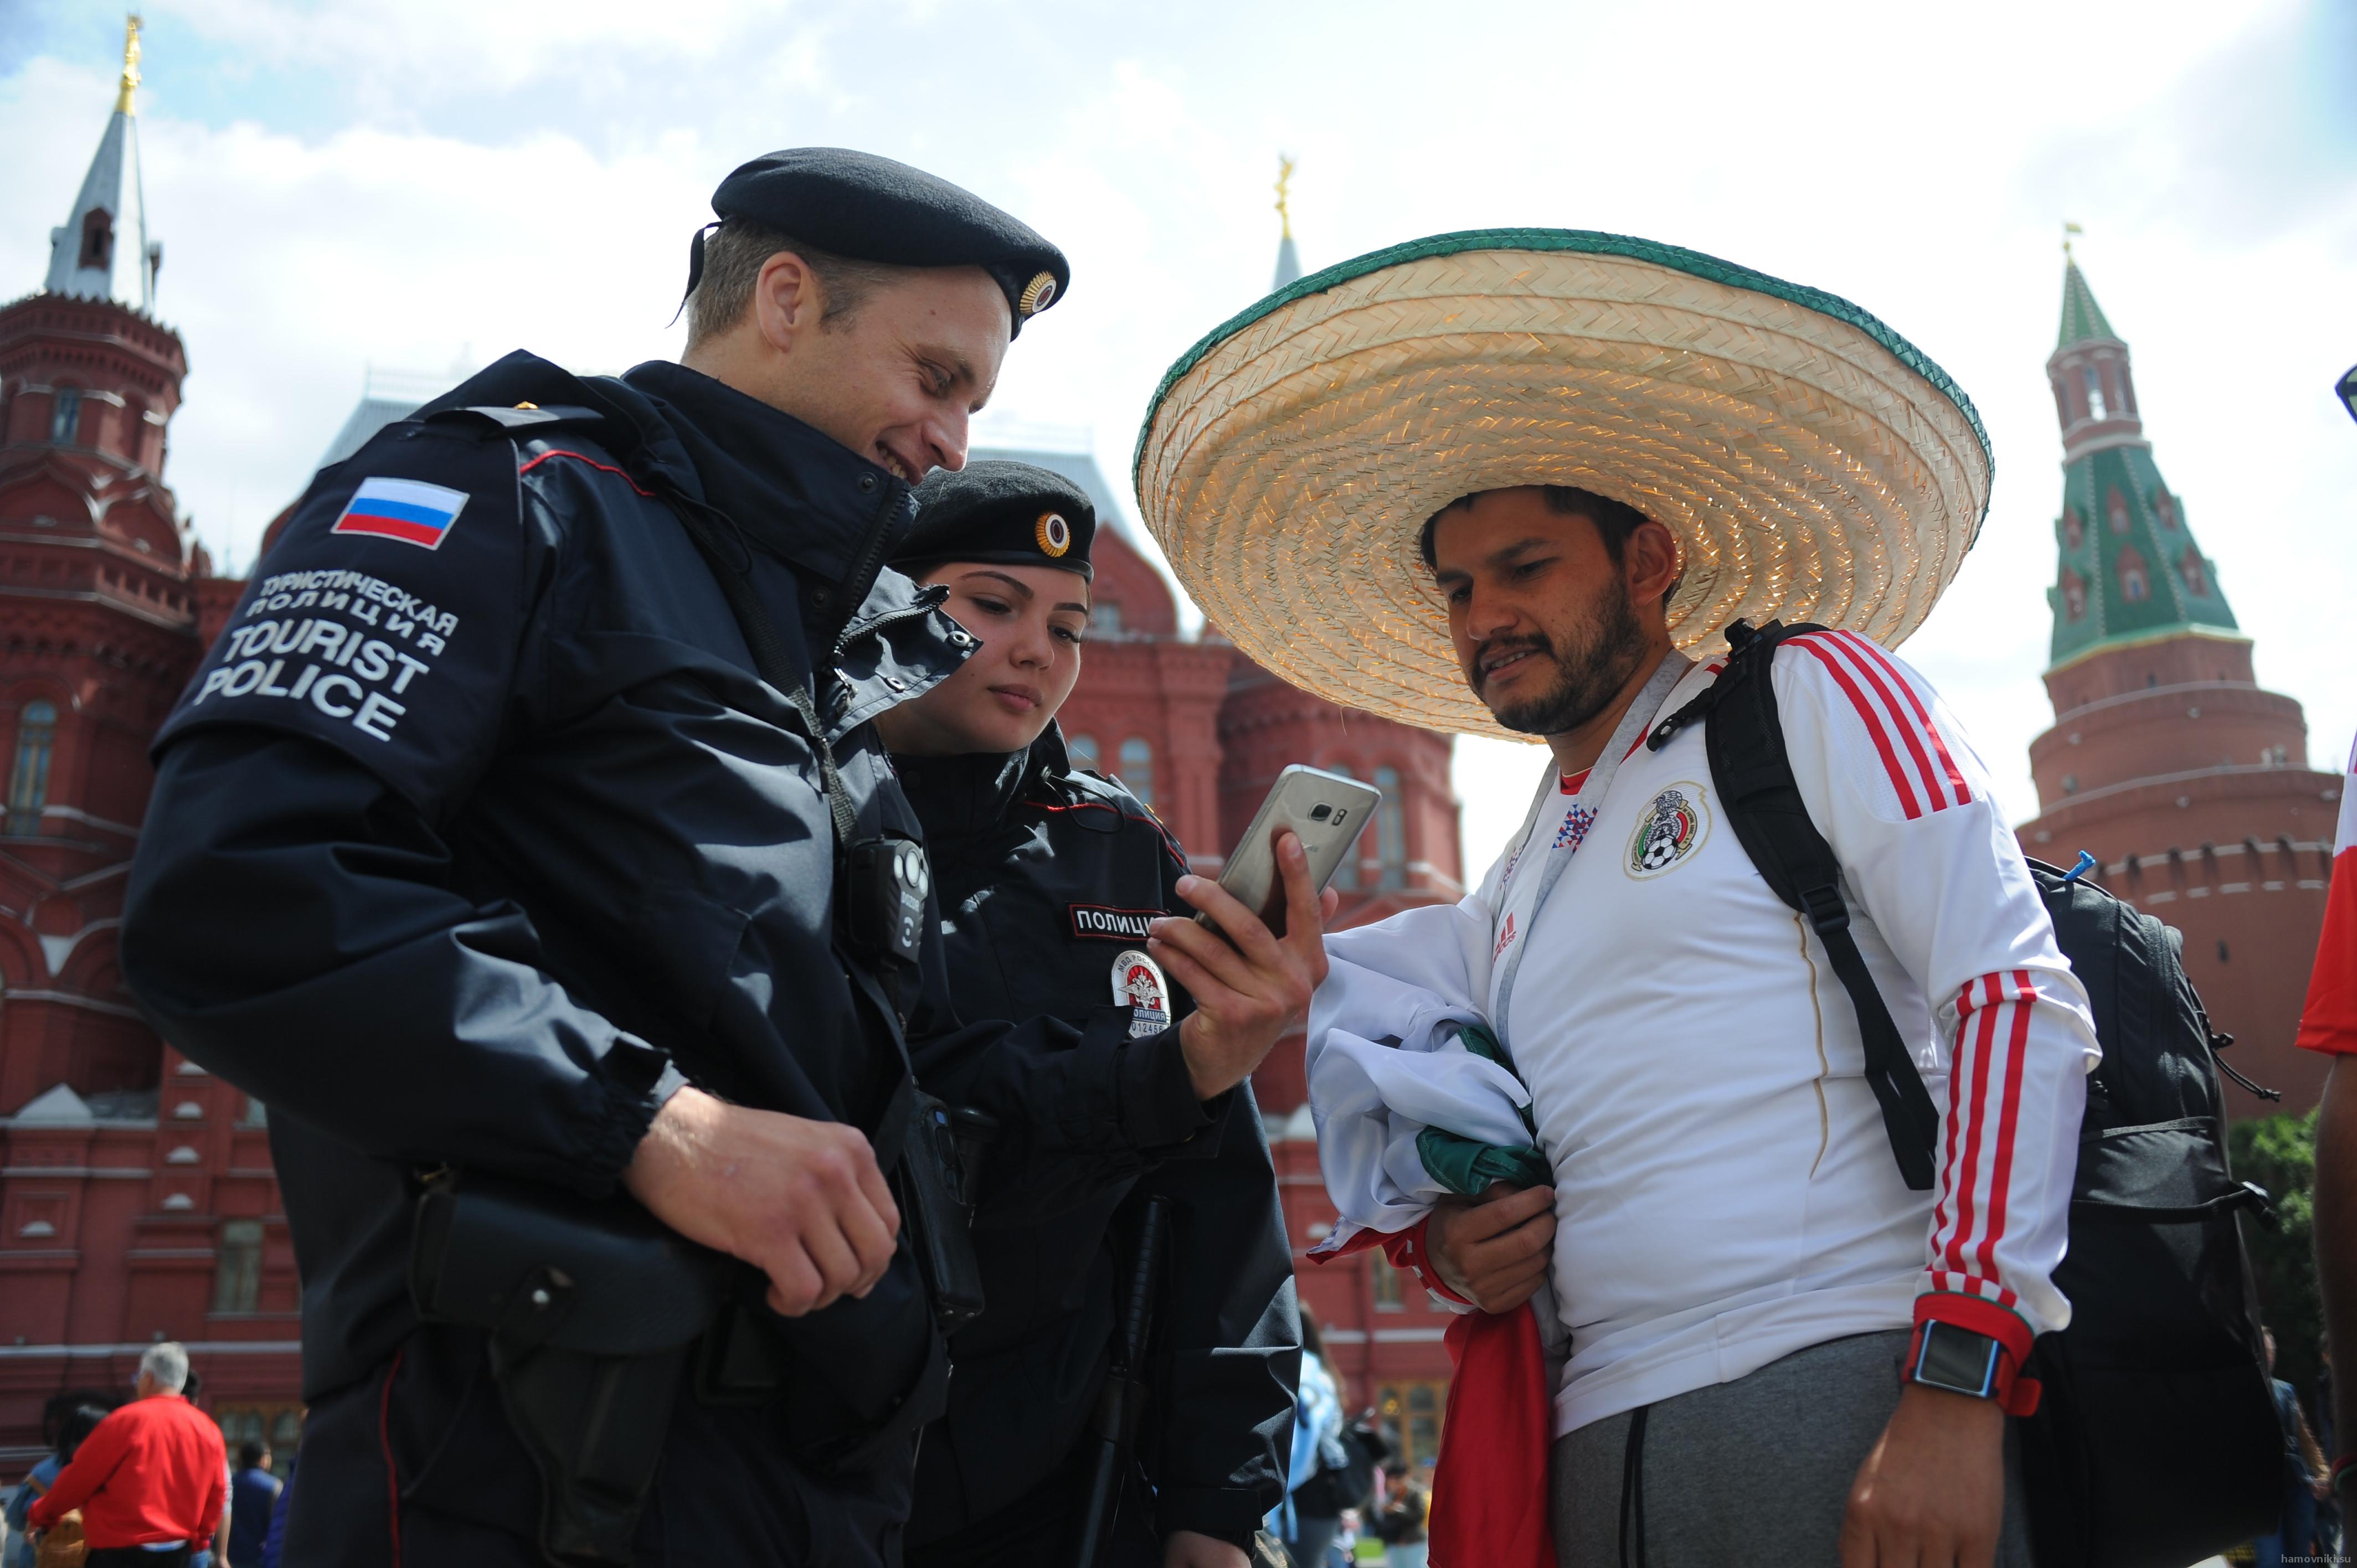 Оперативники Центрального округа разыскали и вернули телефон туристу из Мексики